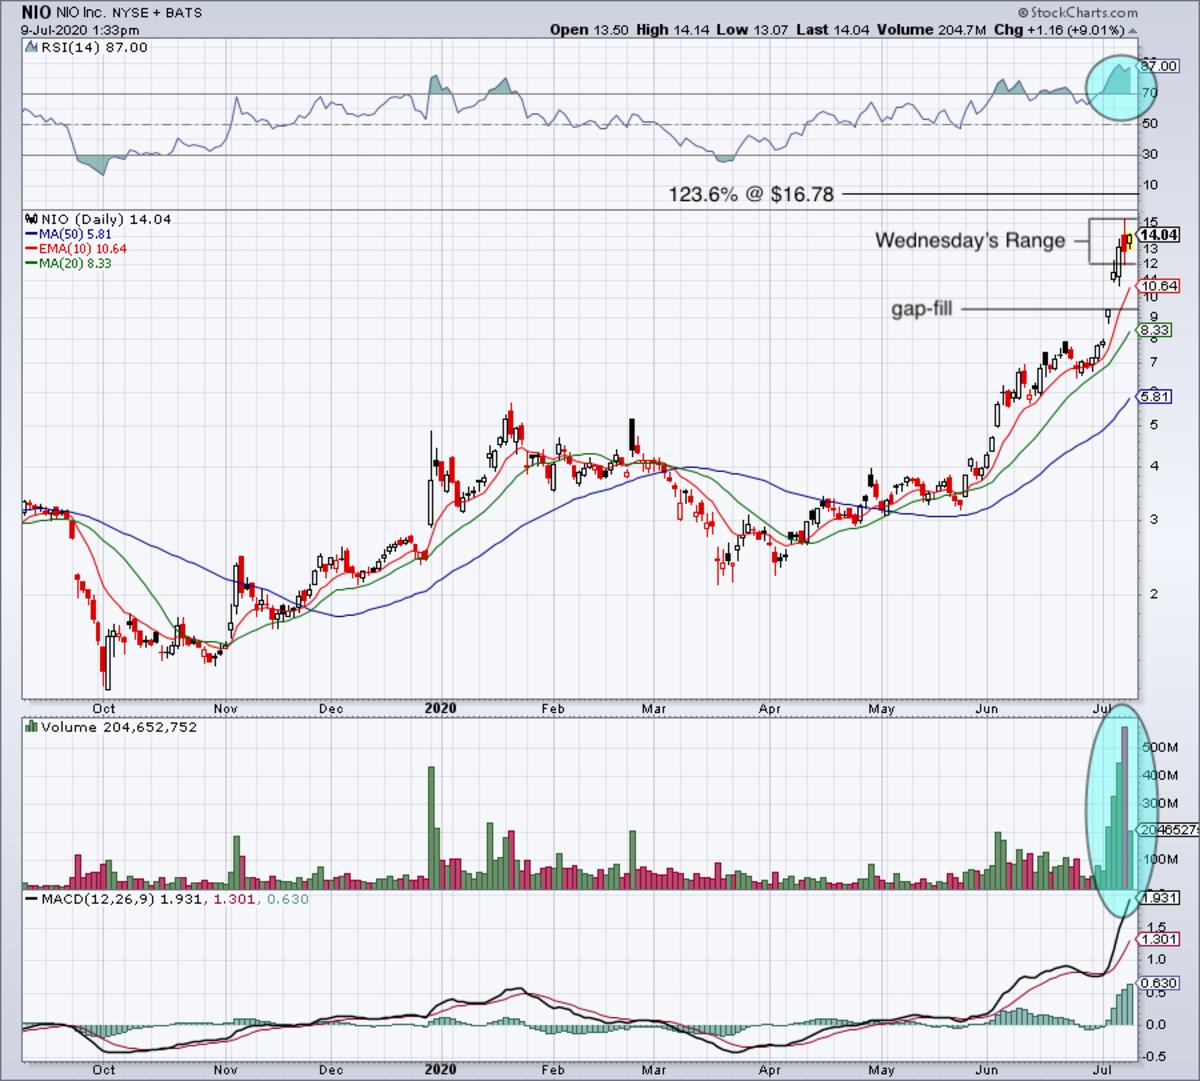 Daily chart of Nio stock.